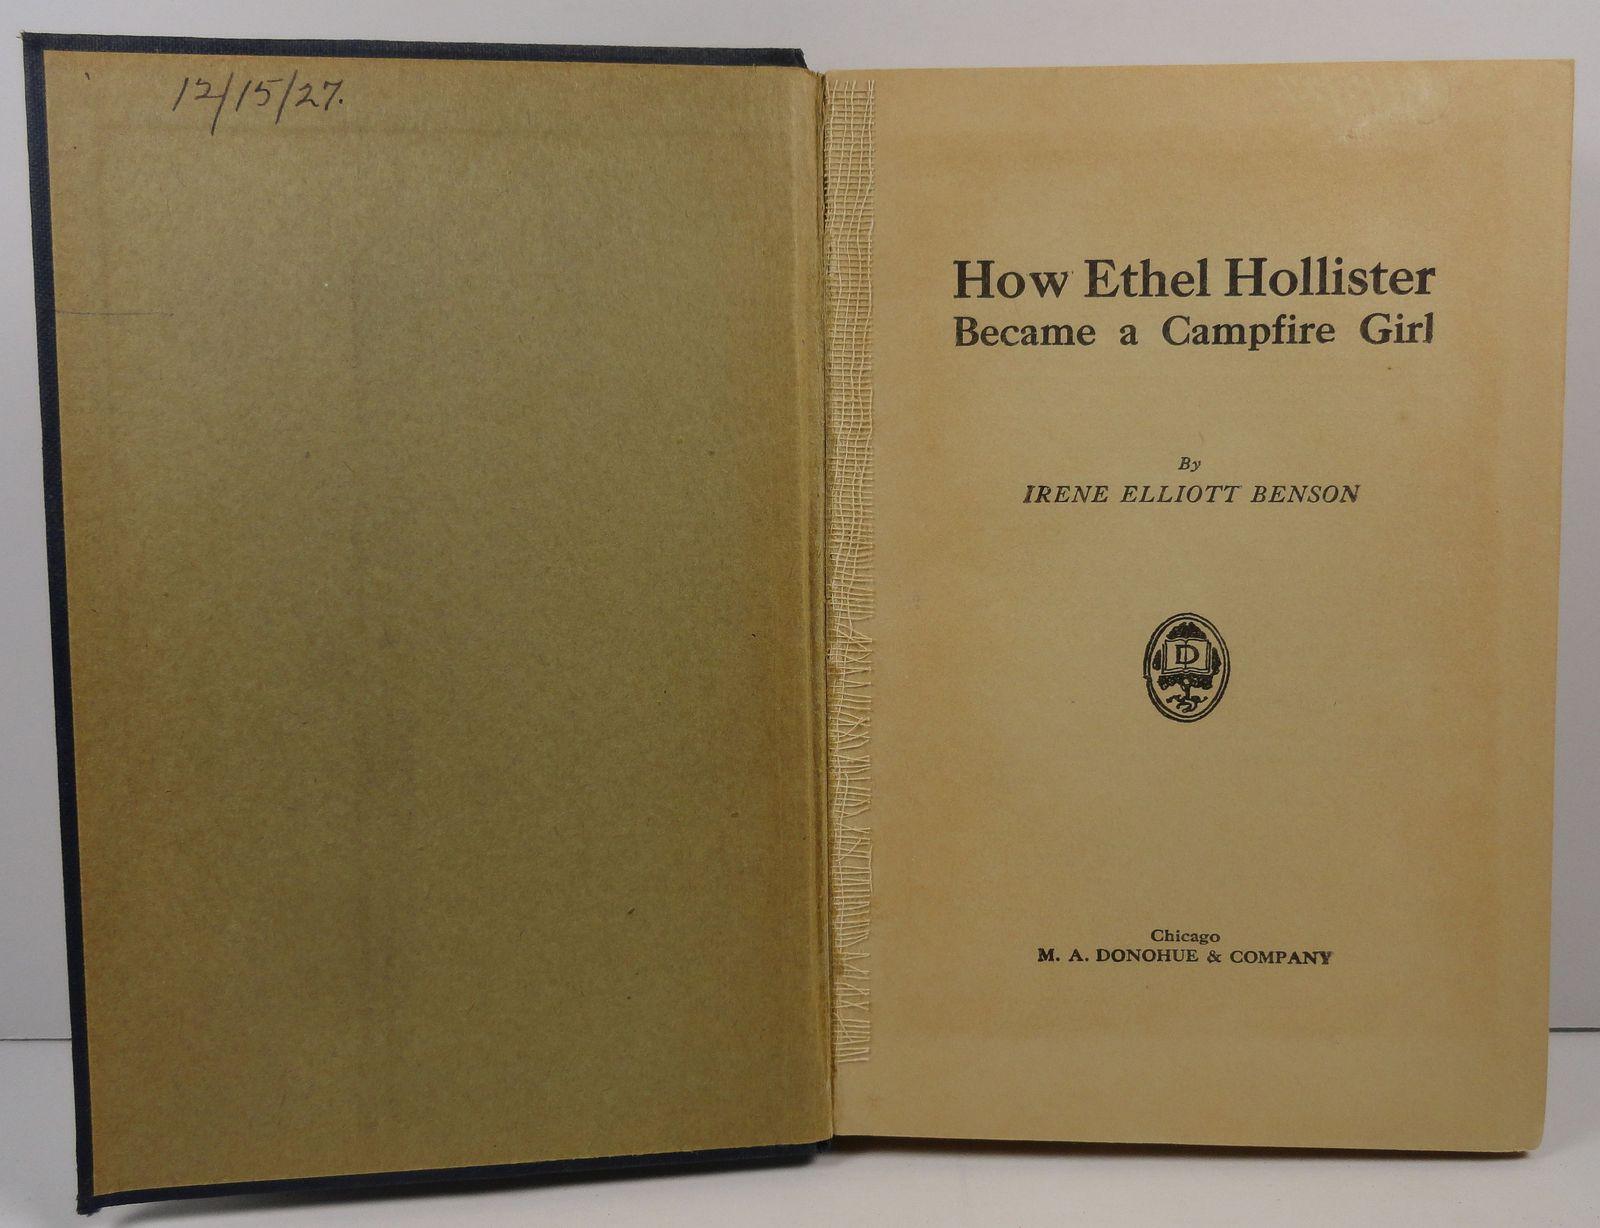 How Ethel Hollister Became a Campfire Girl Irene Elliott Benson